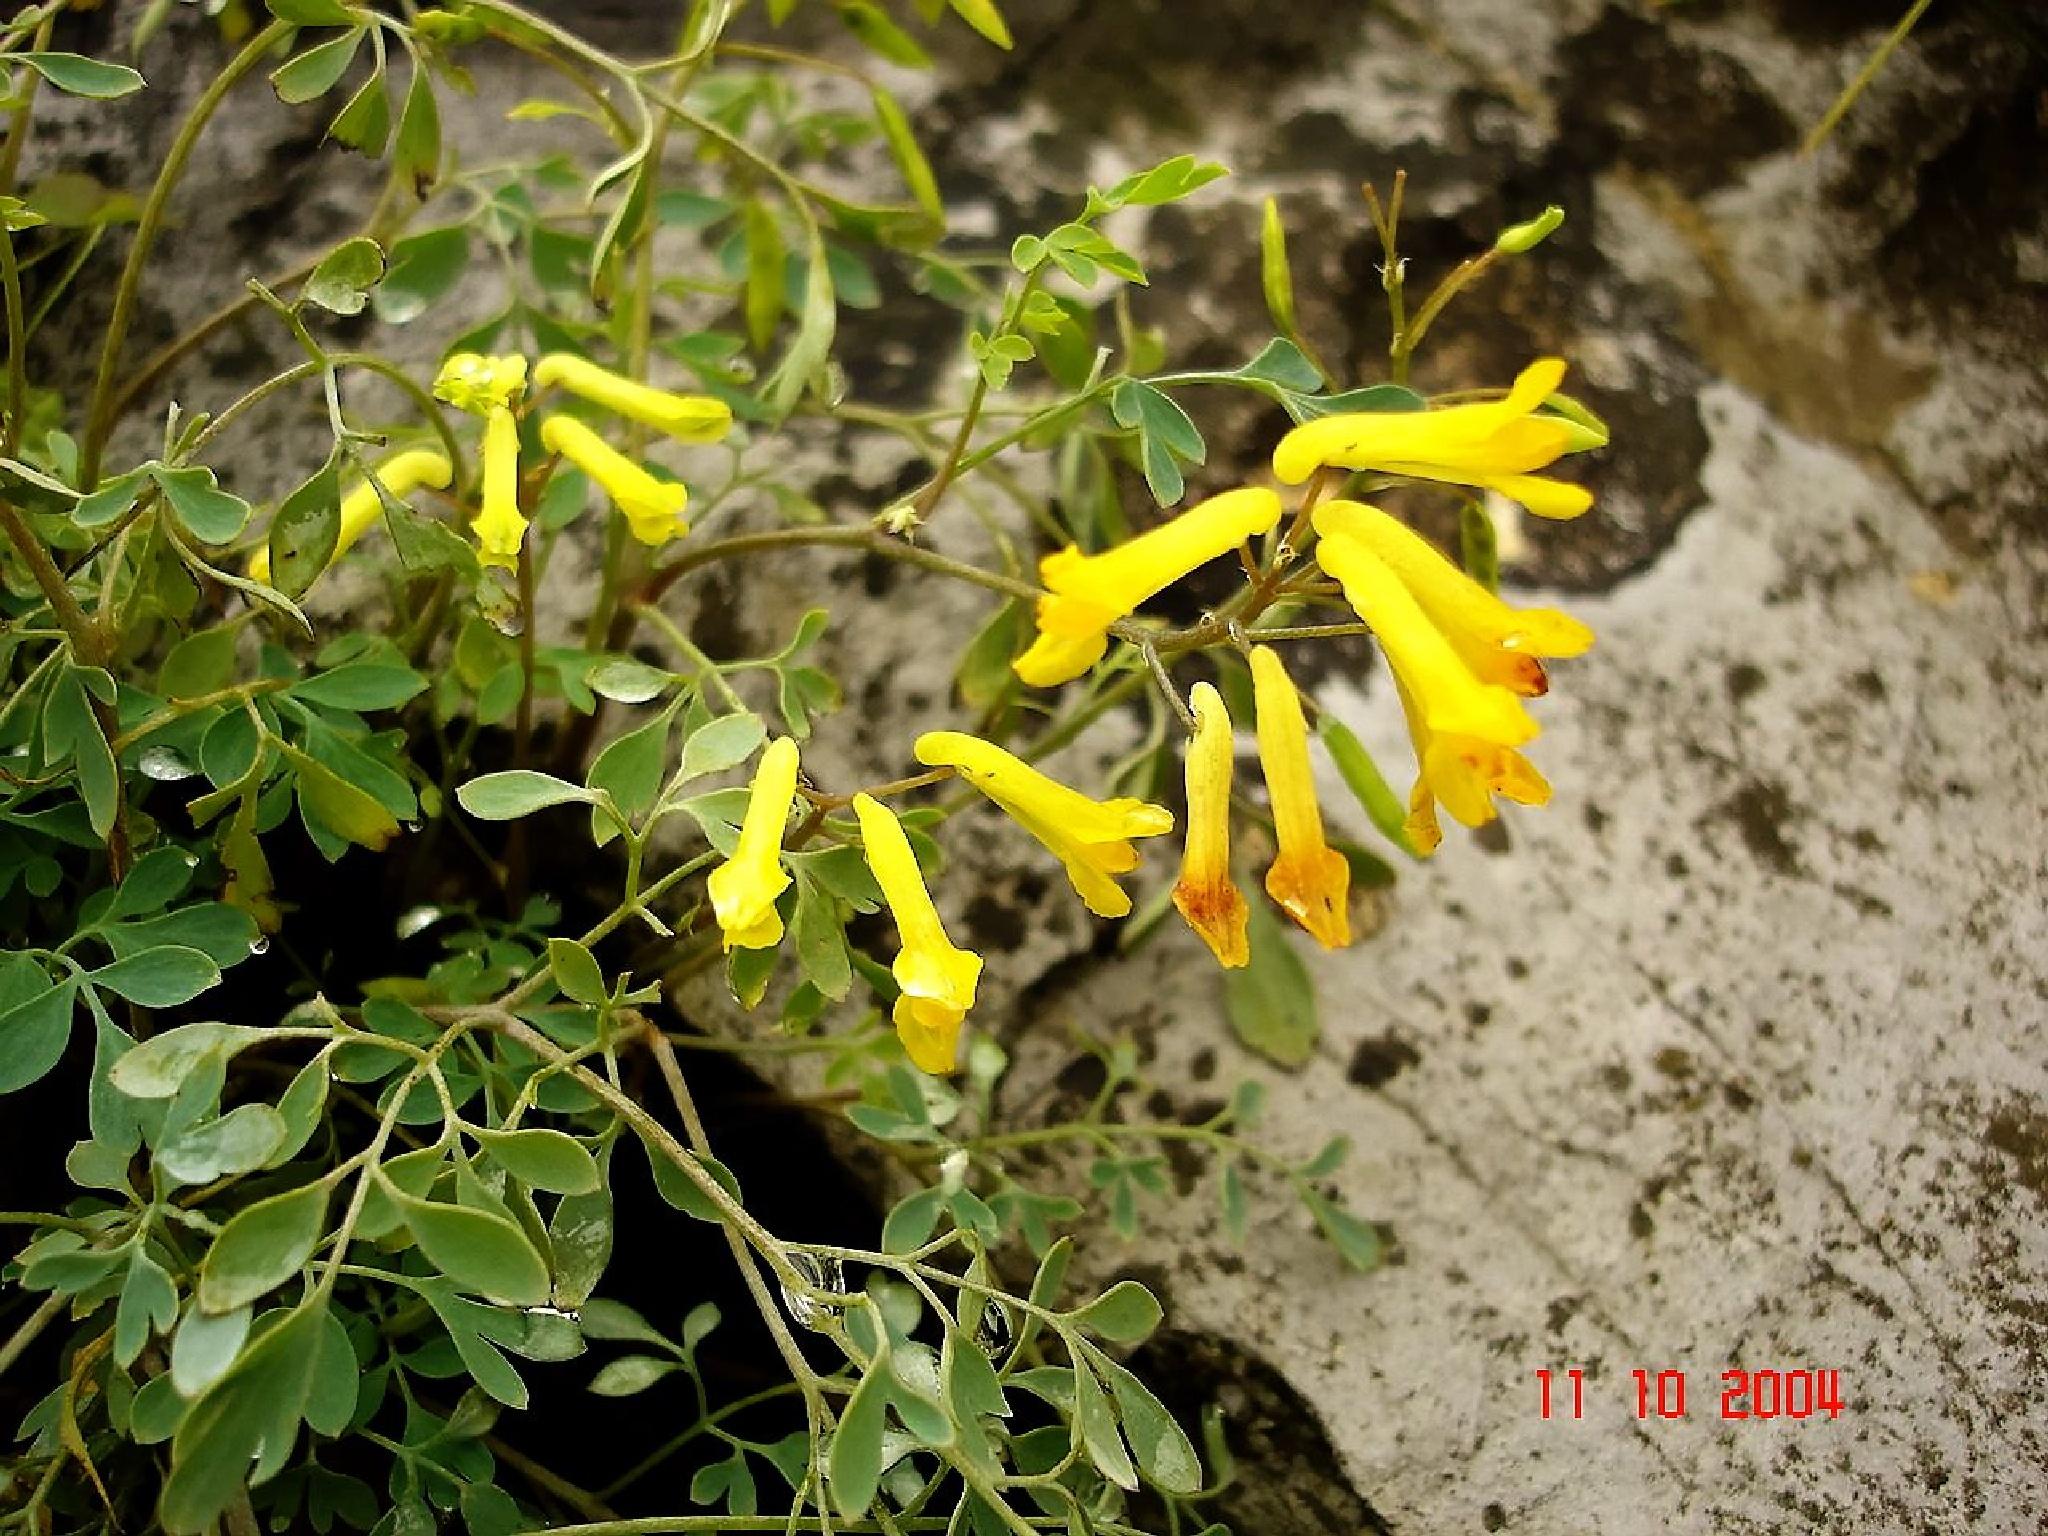 Rumeni petelinček (Corydalis lutea) by zvnktomasevic